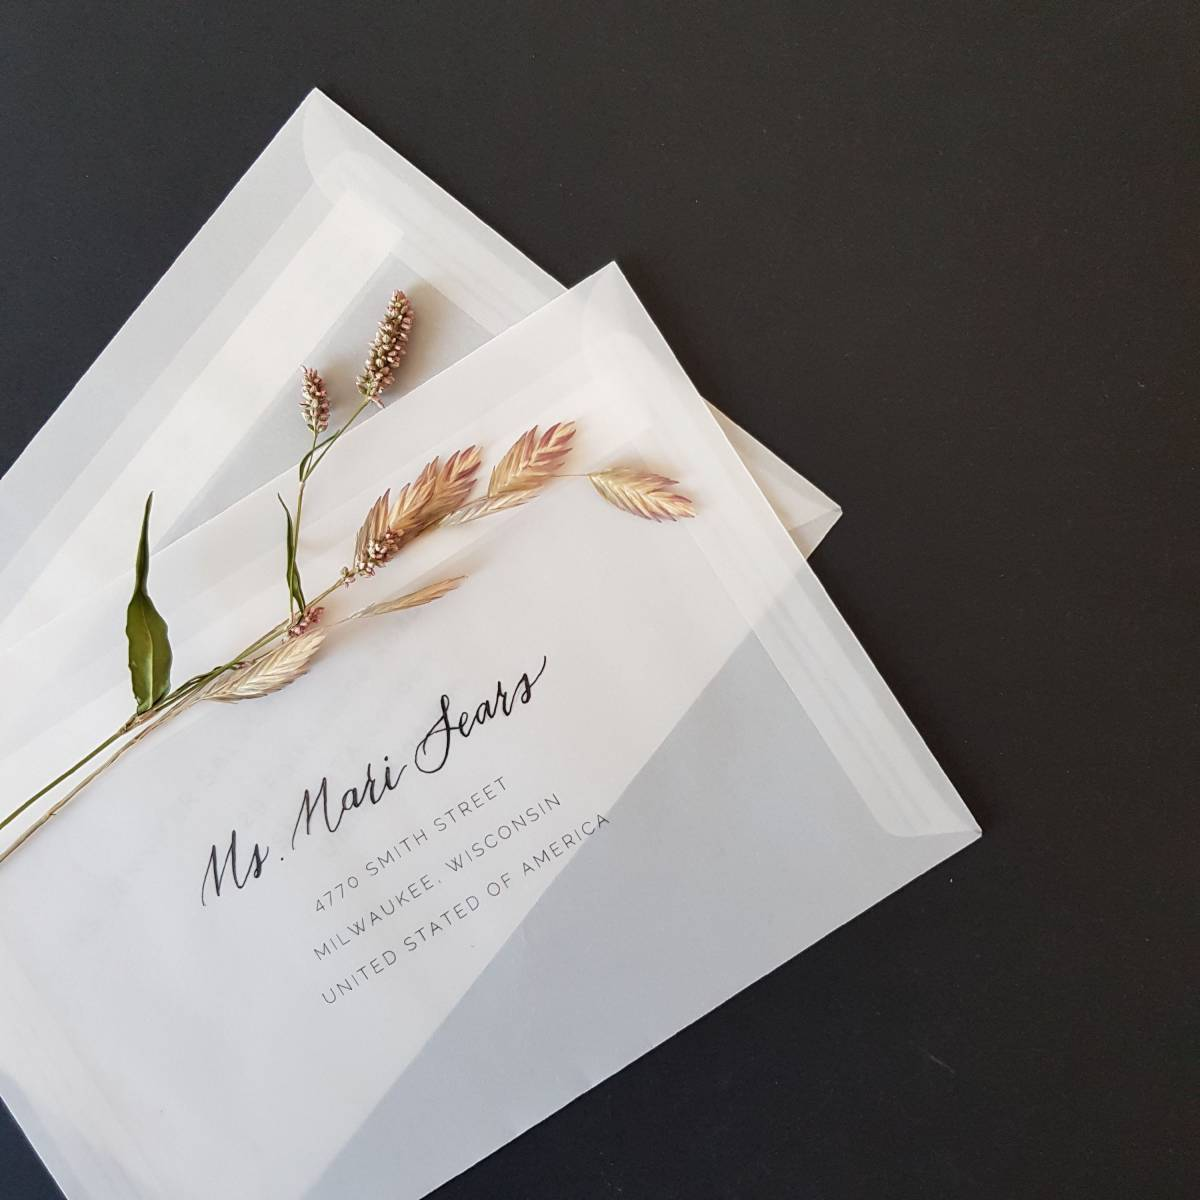 Touch of Gold - Workshops - Vrijgezellen - Trouwuitnodiging - Huwelijksuitnodiging - Kalligrafie - House of Weddings - 3